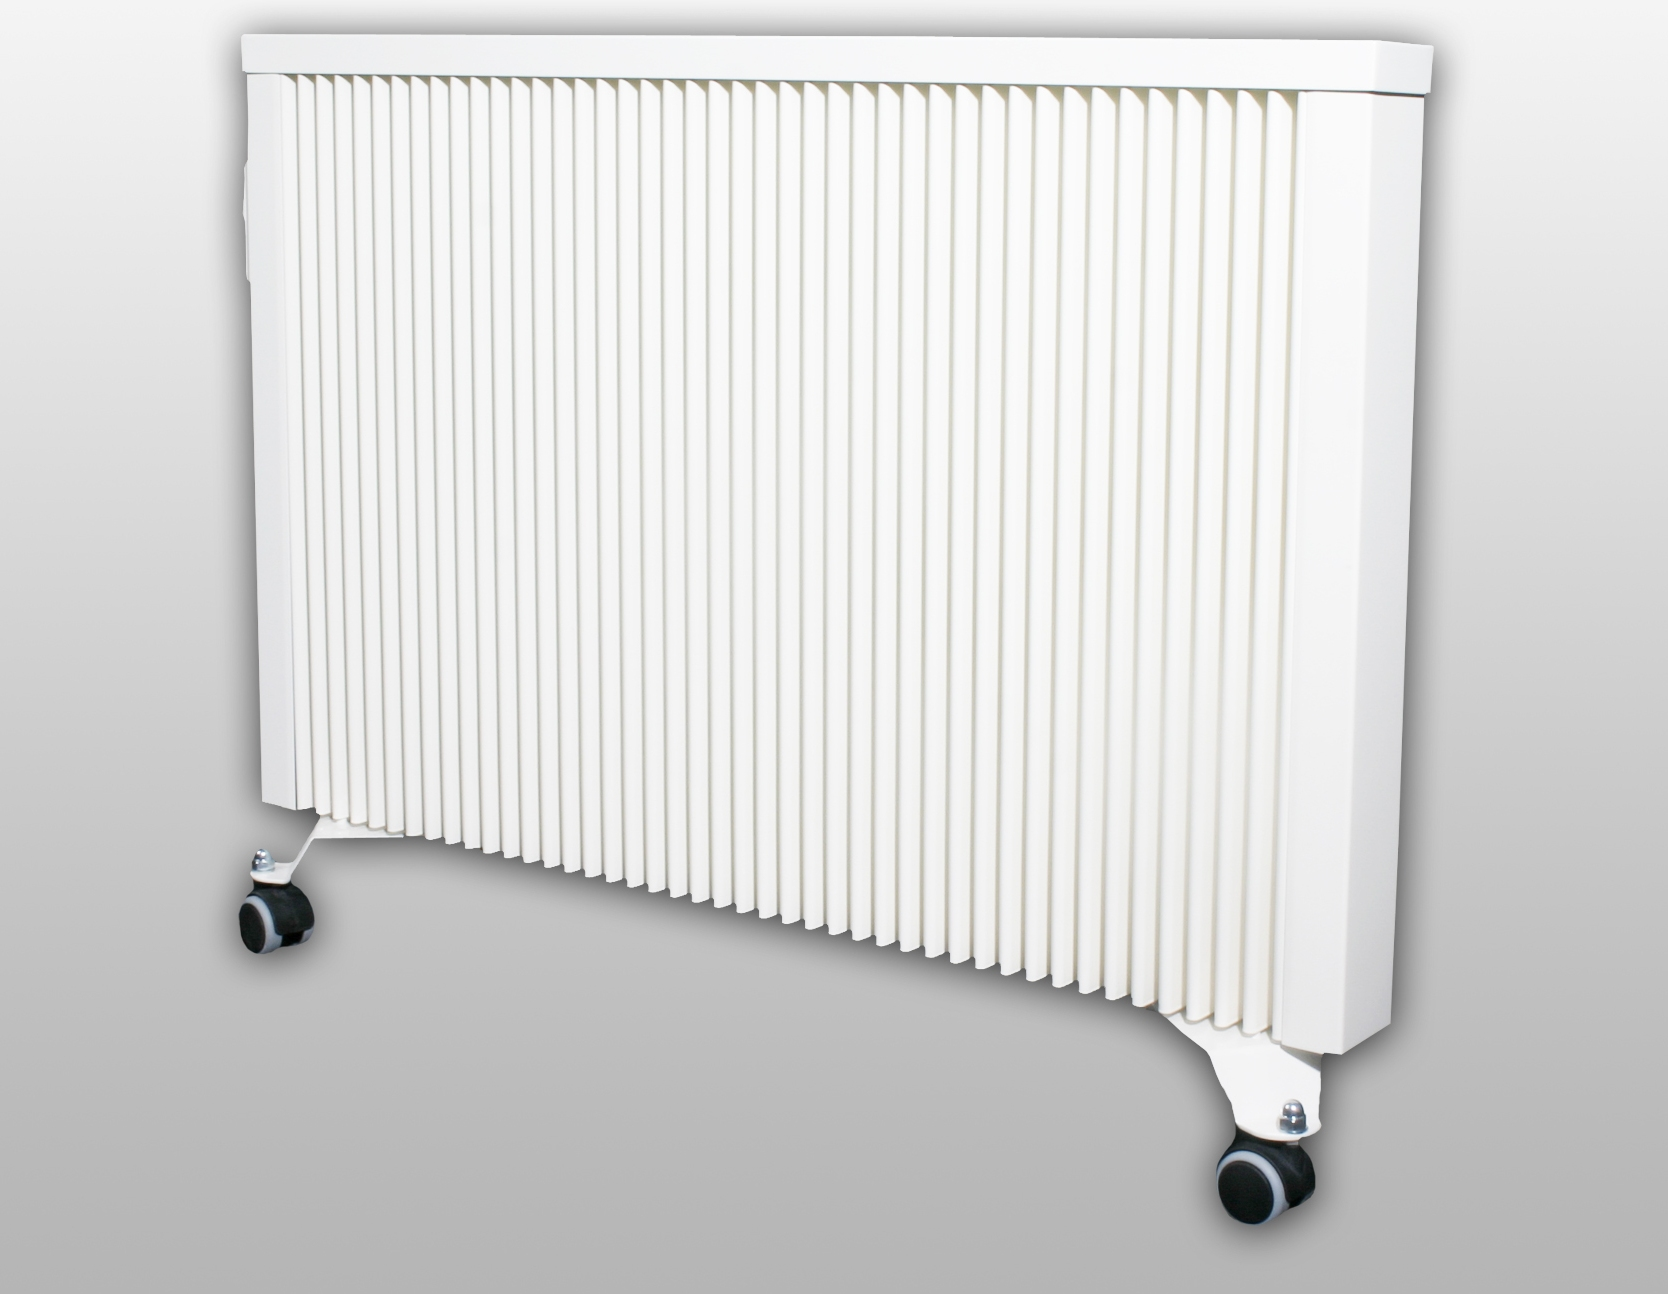 Topný panel série H, TYP H150, 1500 W